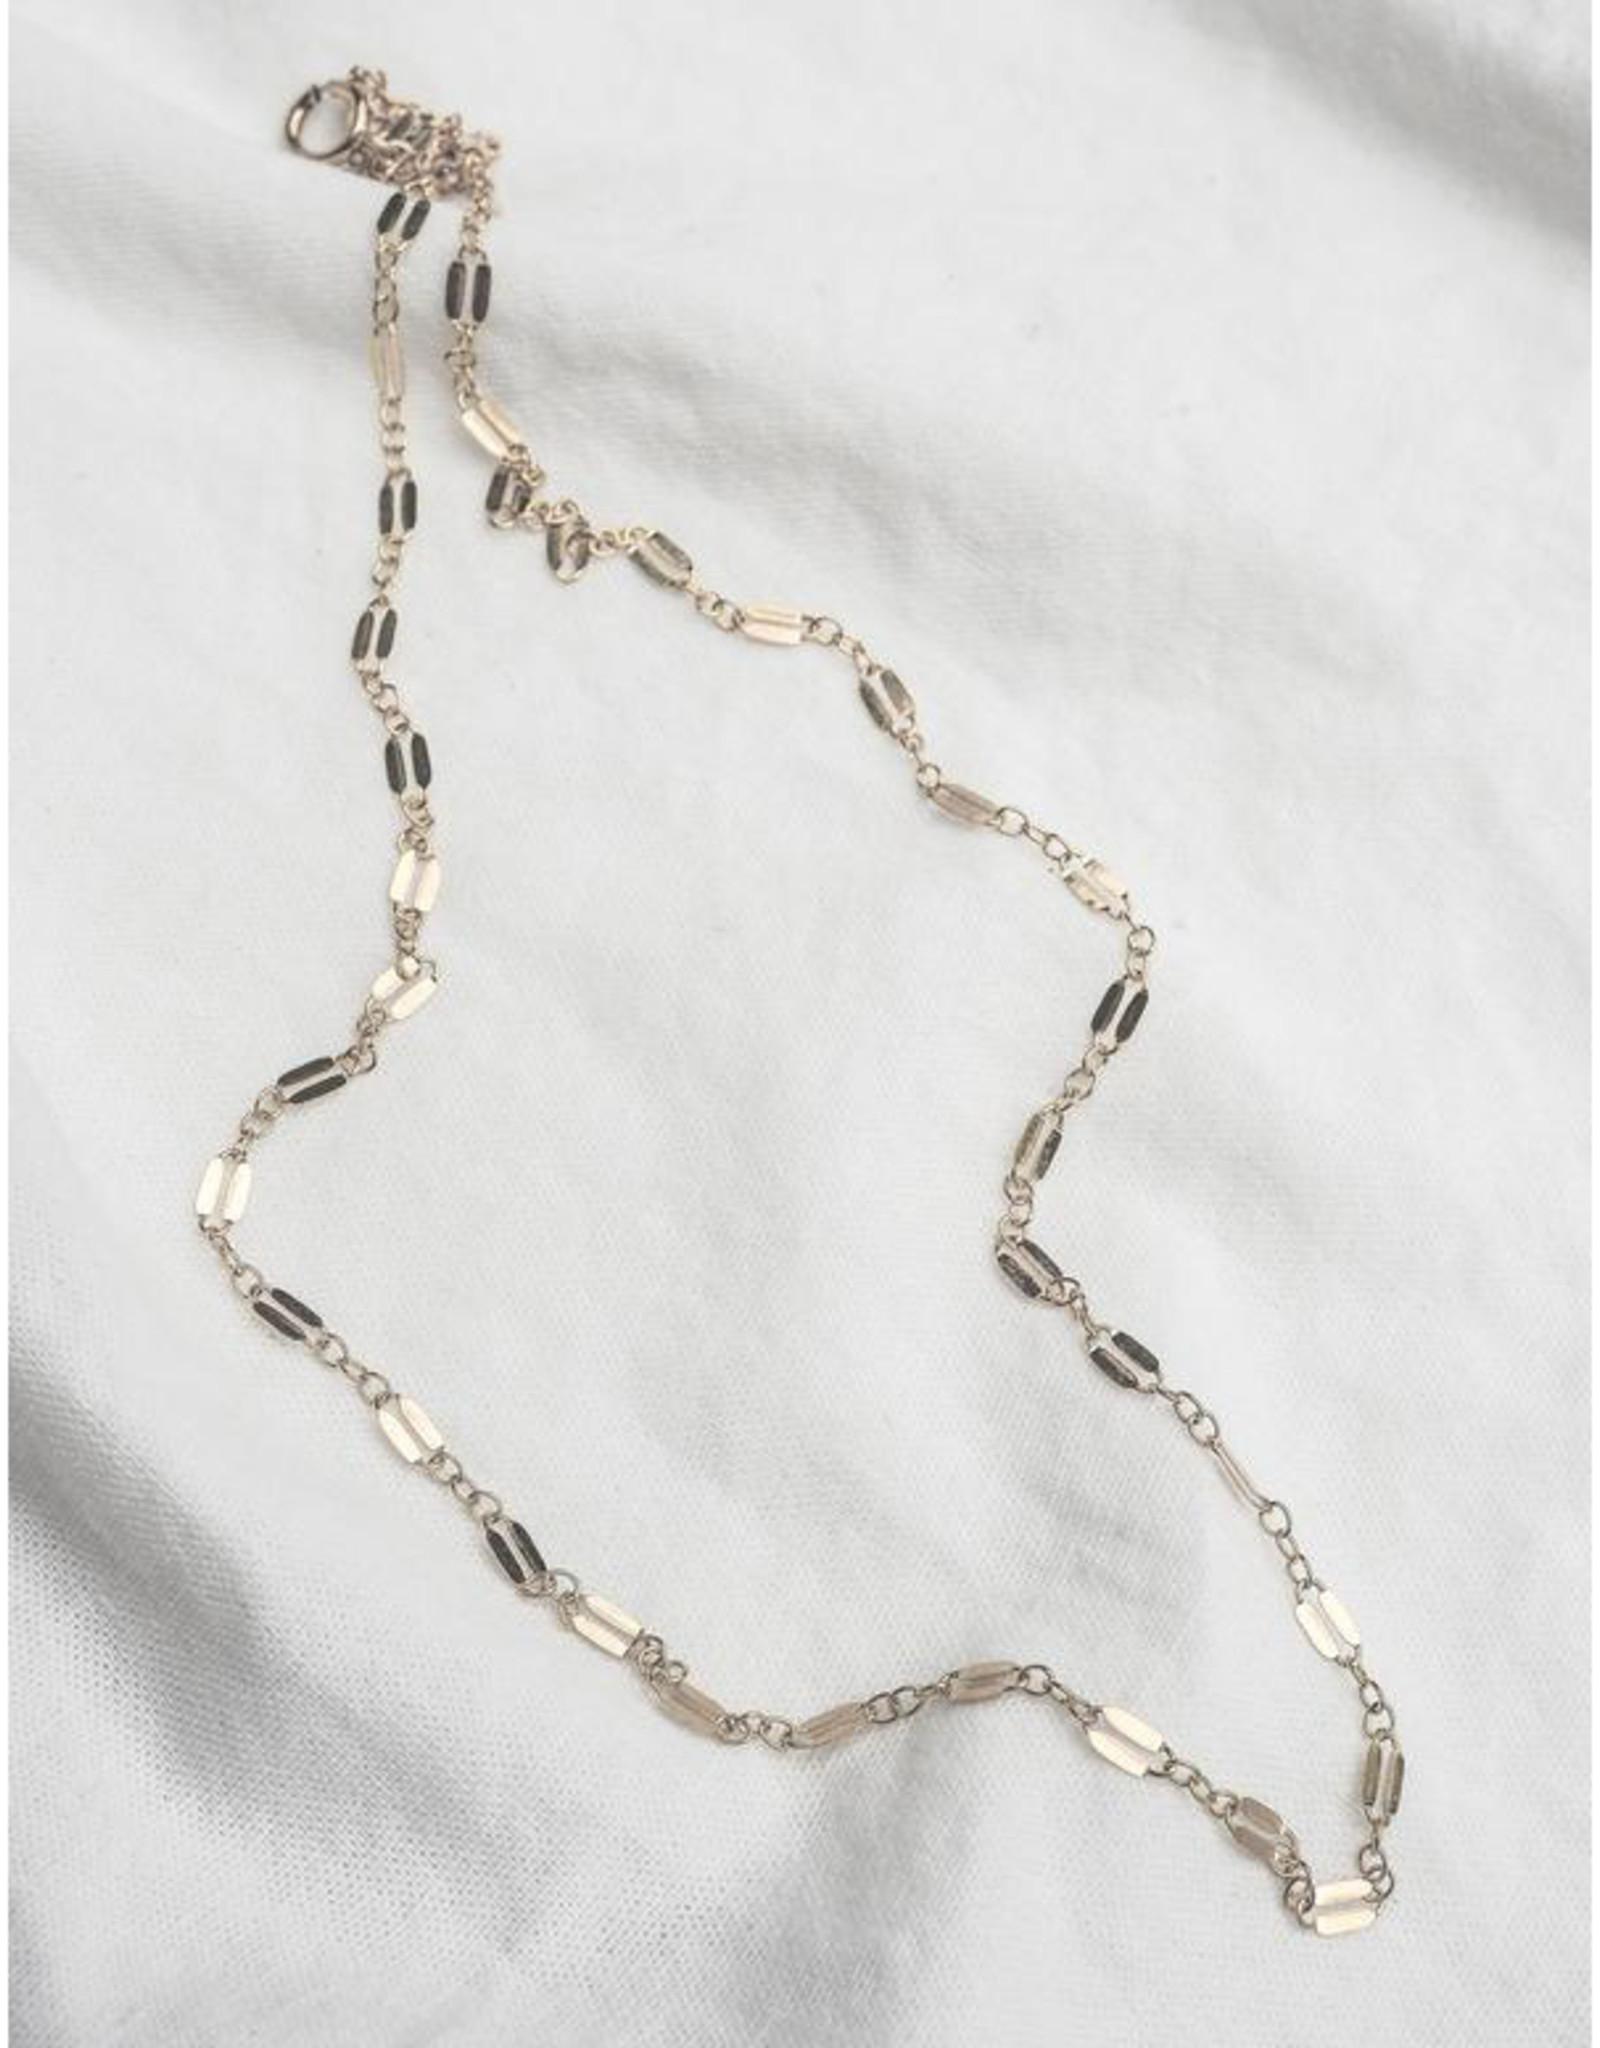 Hart + Stone Helix Necklace - Argentium Silver